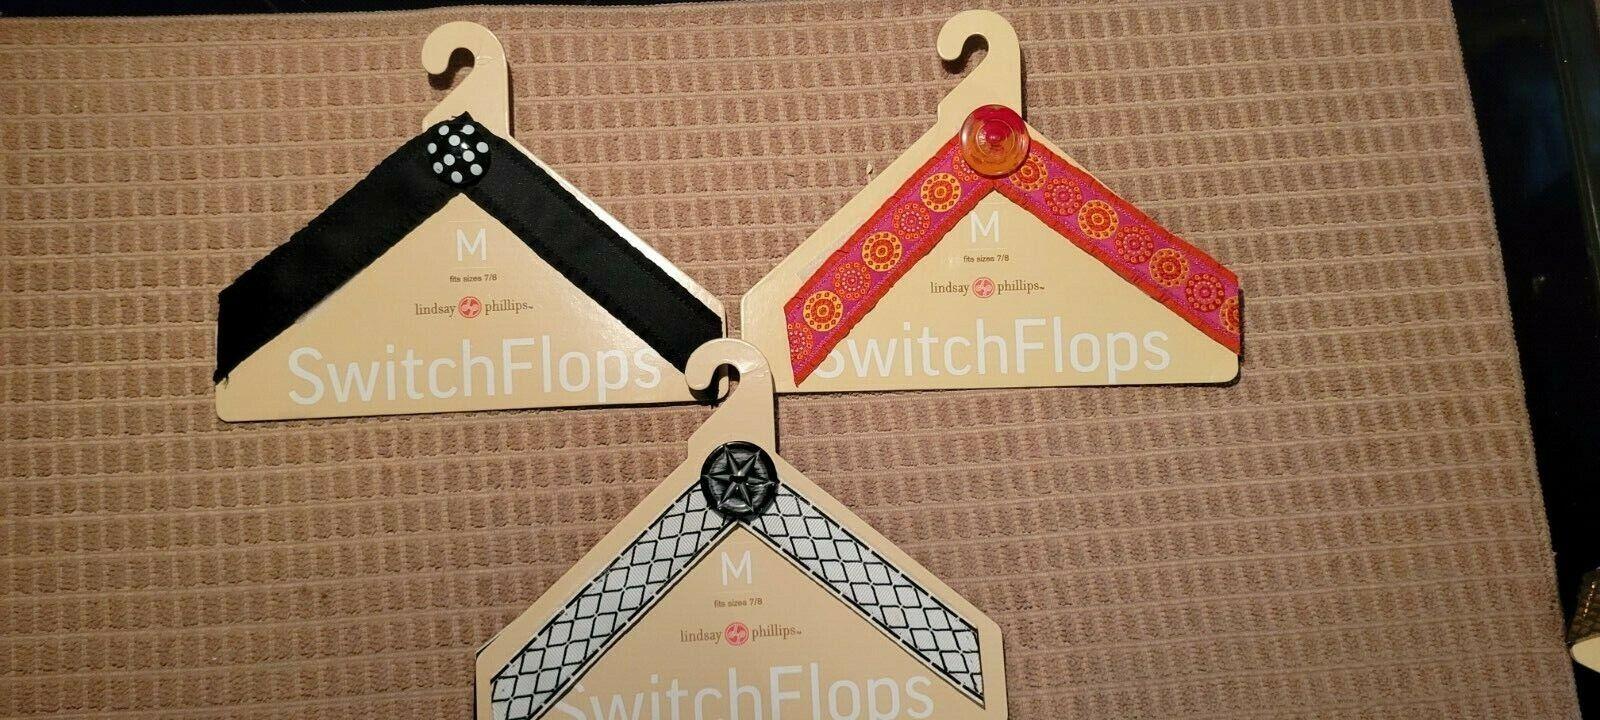 Switchflops LINDSAY PHILLIPS 3 Interchange Straps Med 7/8 NWT Evan Roz Chelsey